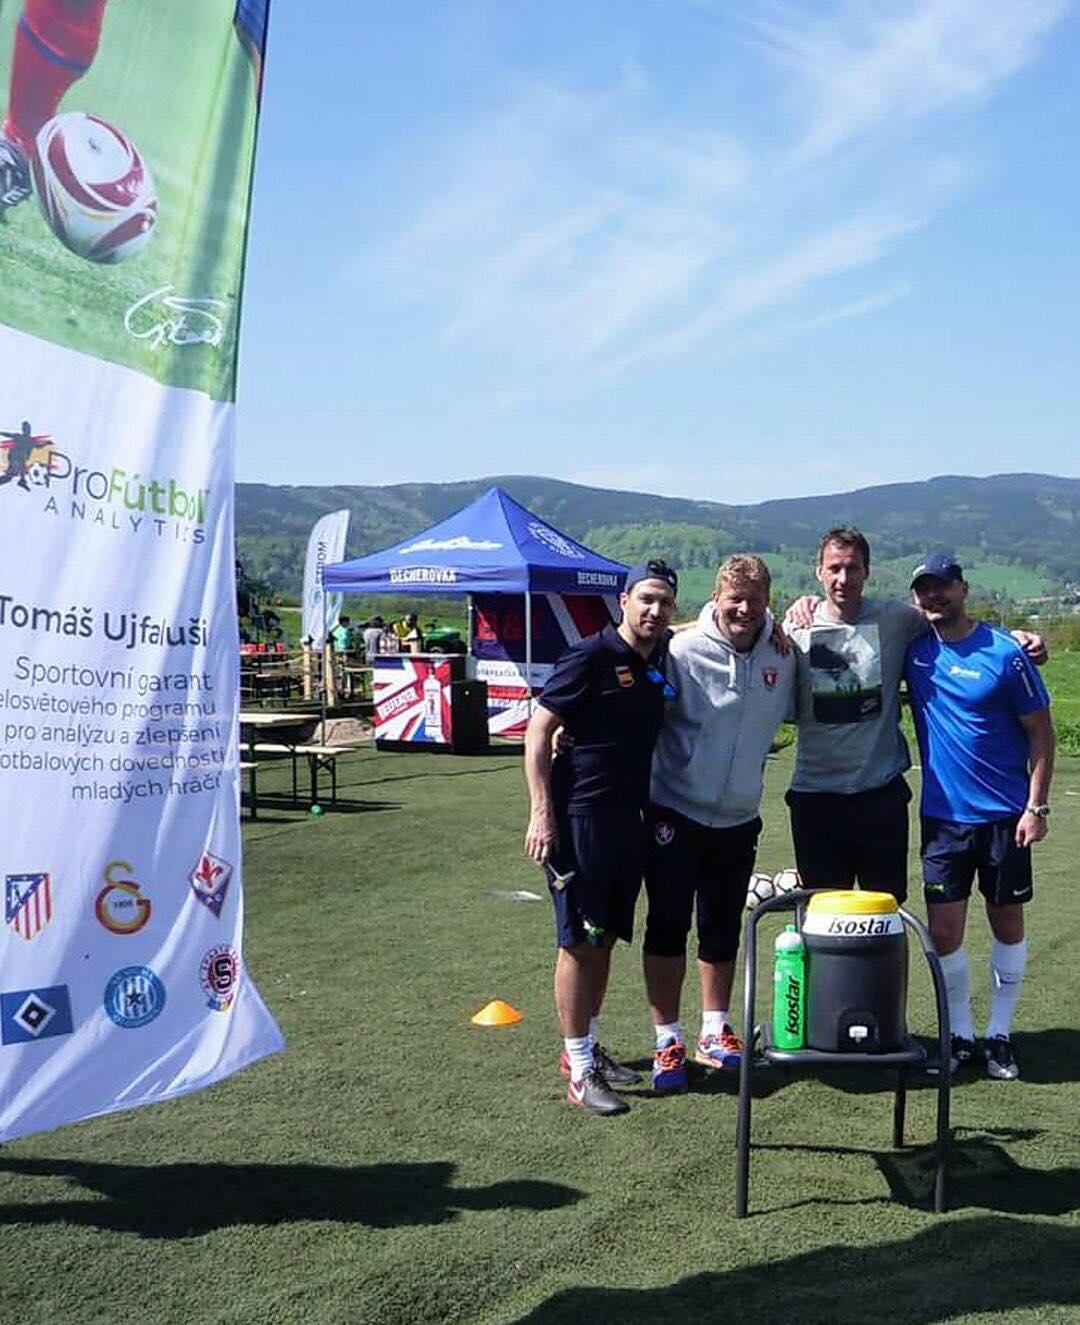 FotbalPark Liberec FotbalGolf